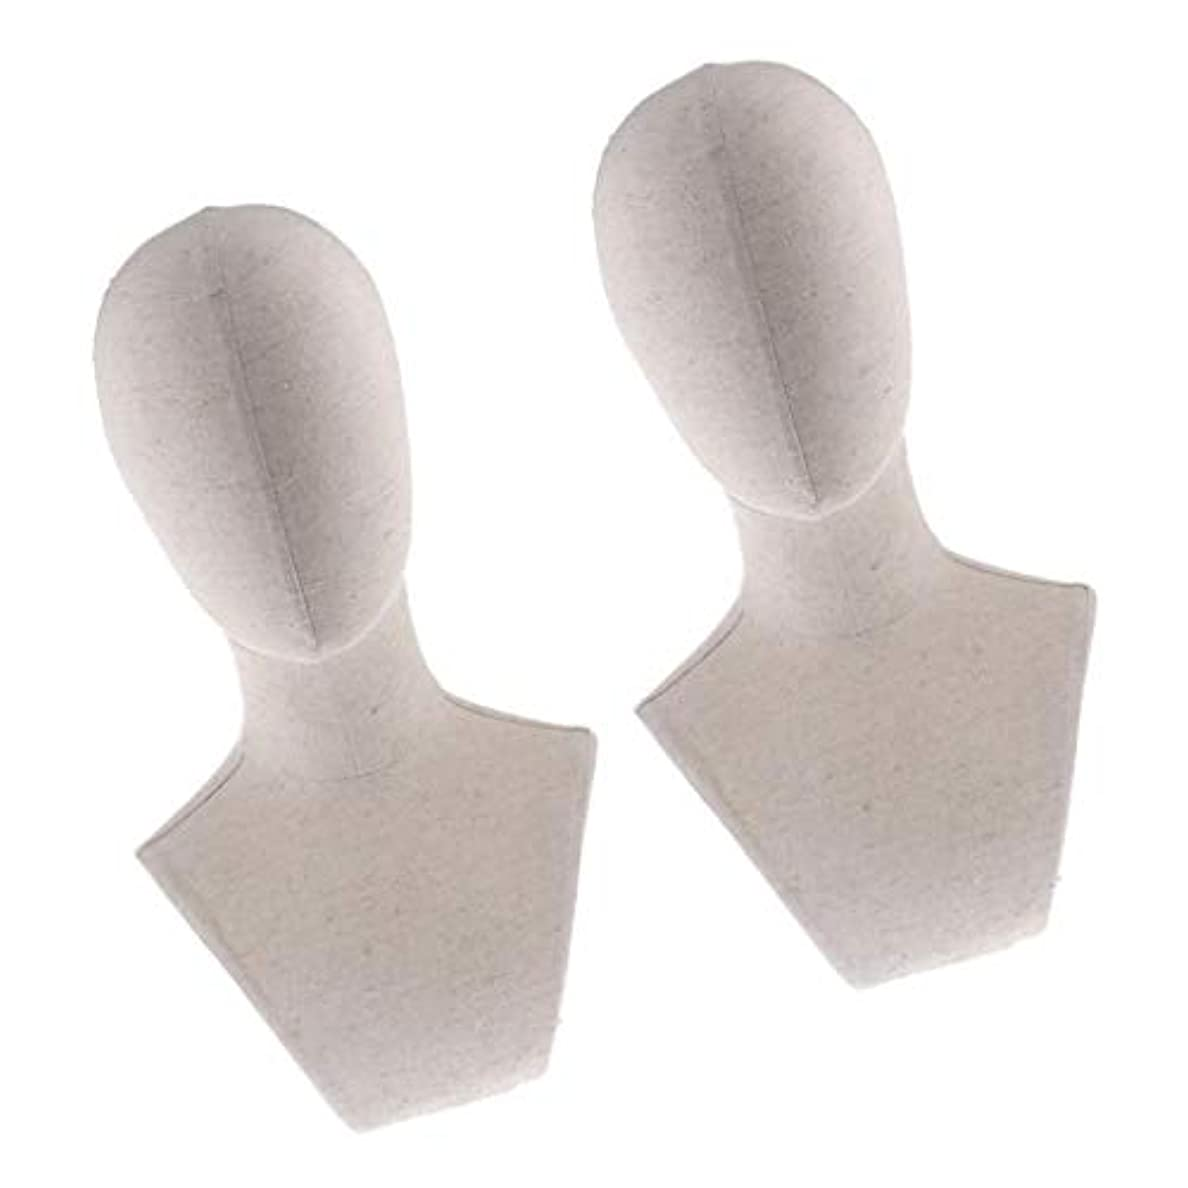 DYNWAVE プラスチック マネキン ヘッド トルソー 頭 カット練習 頭部 女性 ウィッグマネキン ウィッグスタンド2個